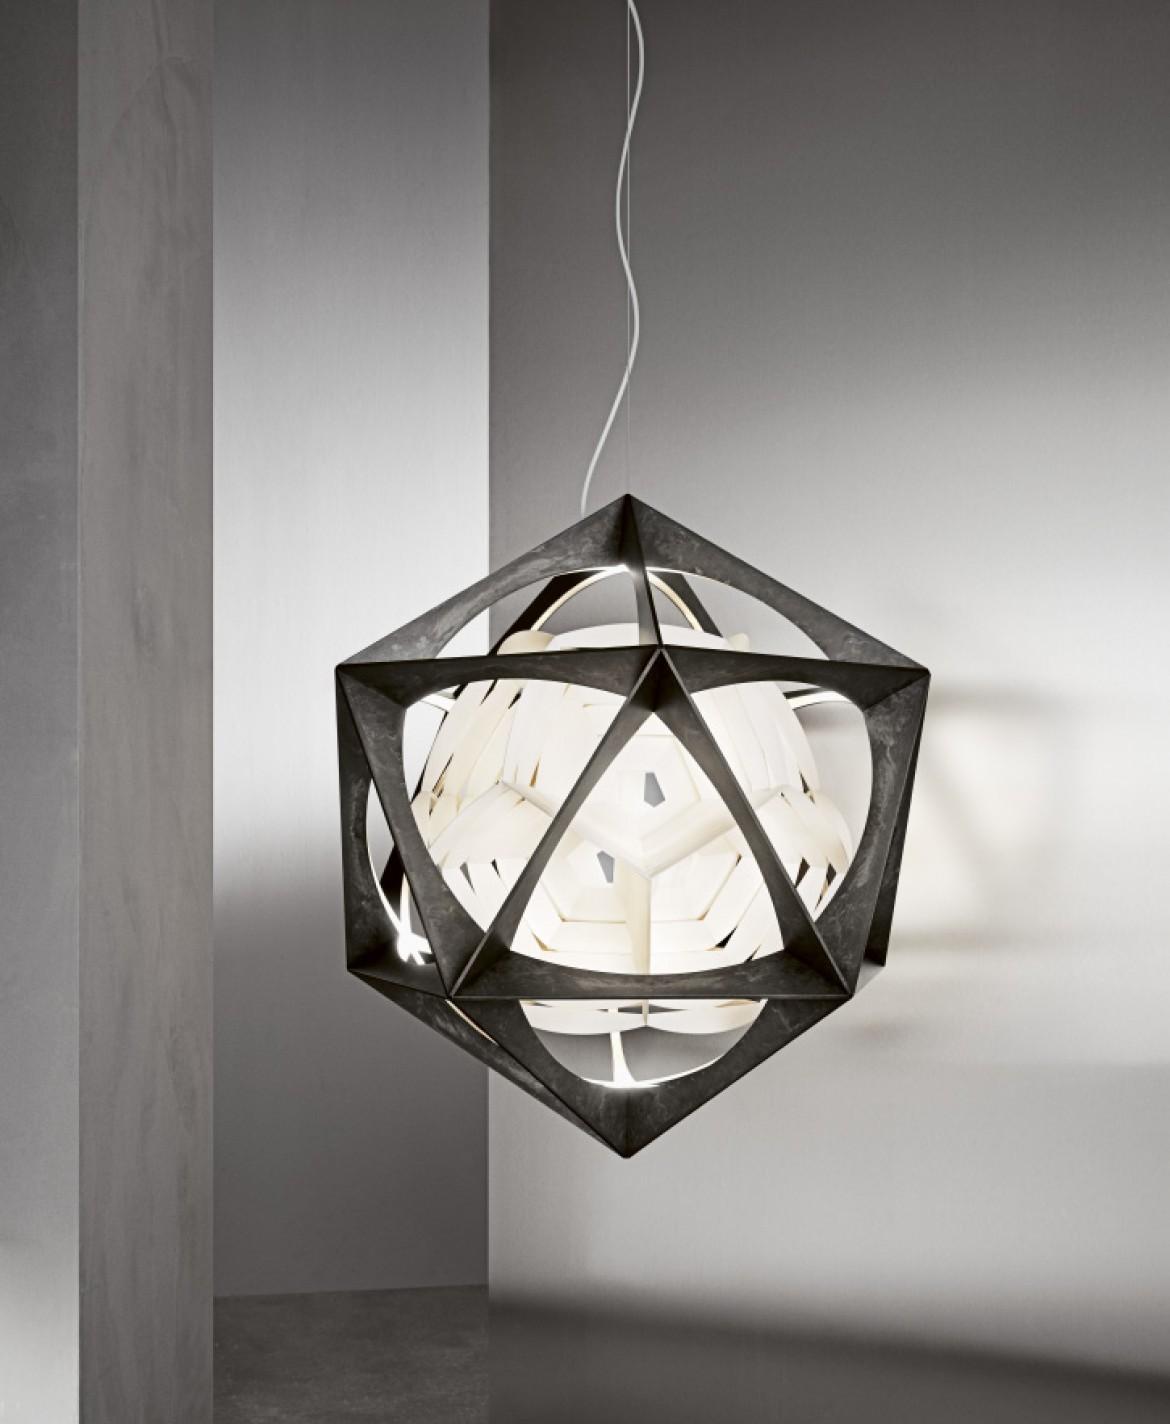 Design to shape light